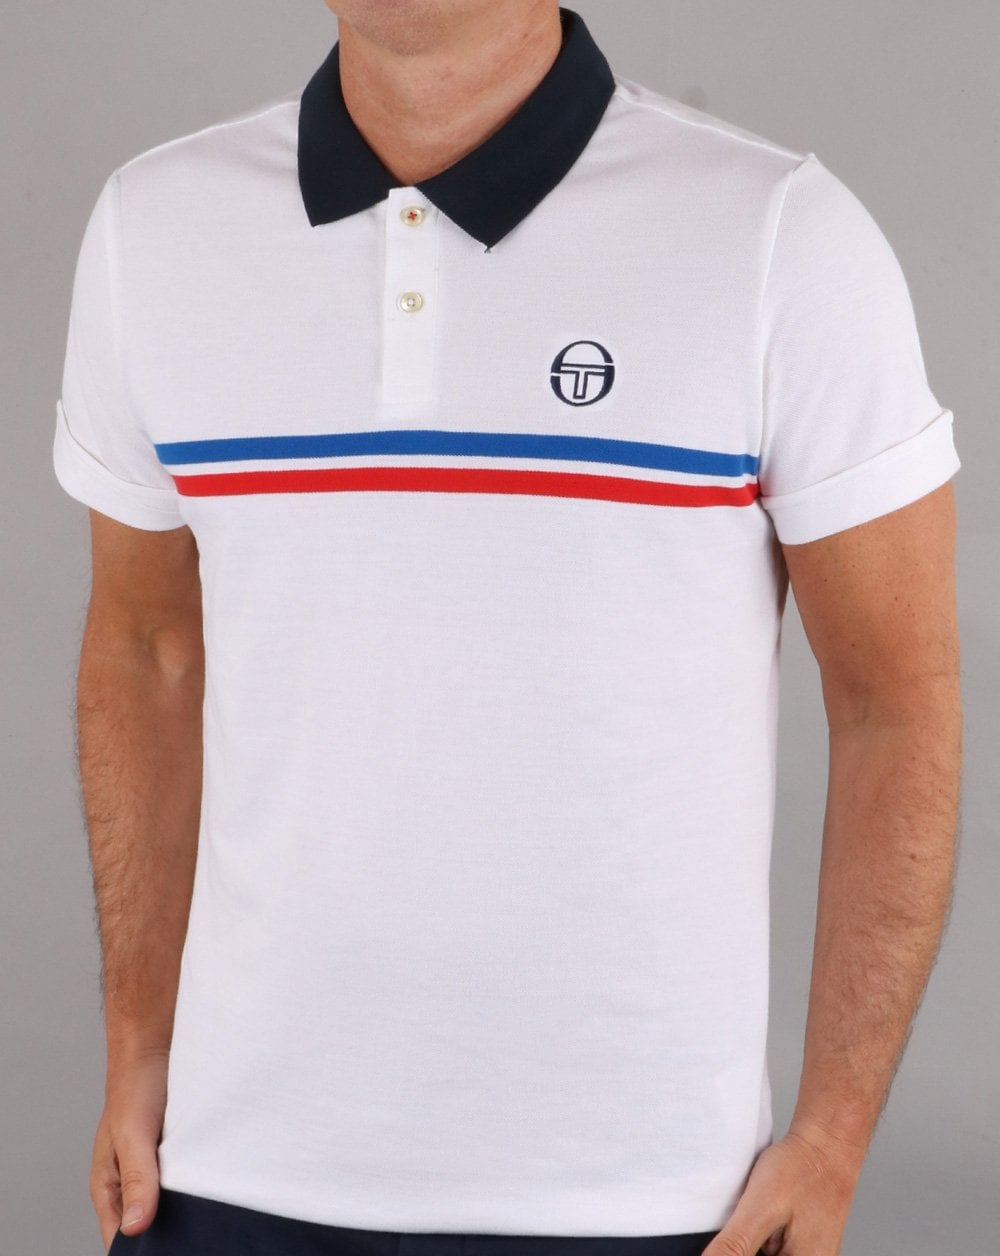 63141cc4 Sergio Tacchini Sergio Tacchini Supermac Polo Shirt White/Royal/Red